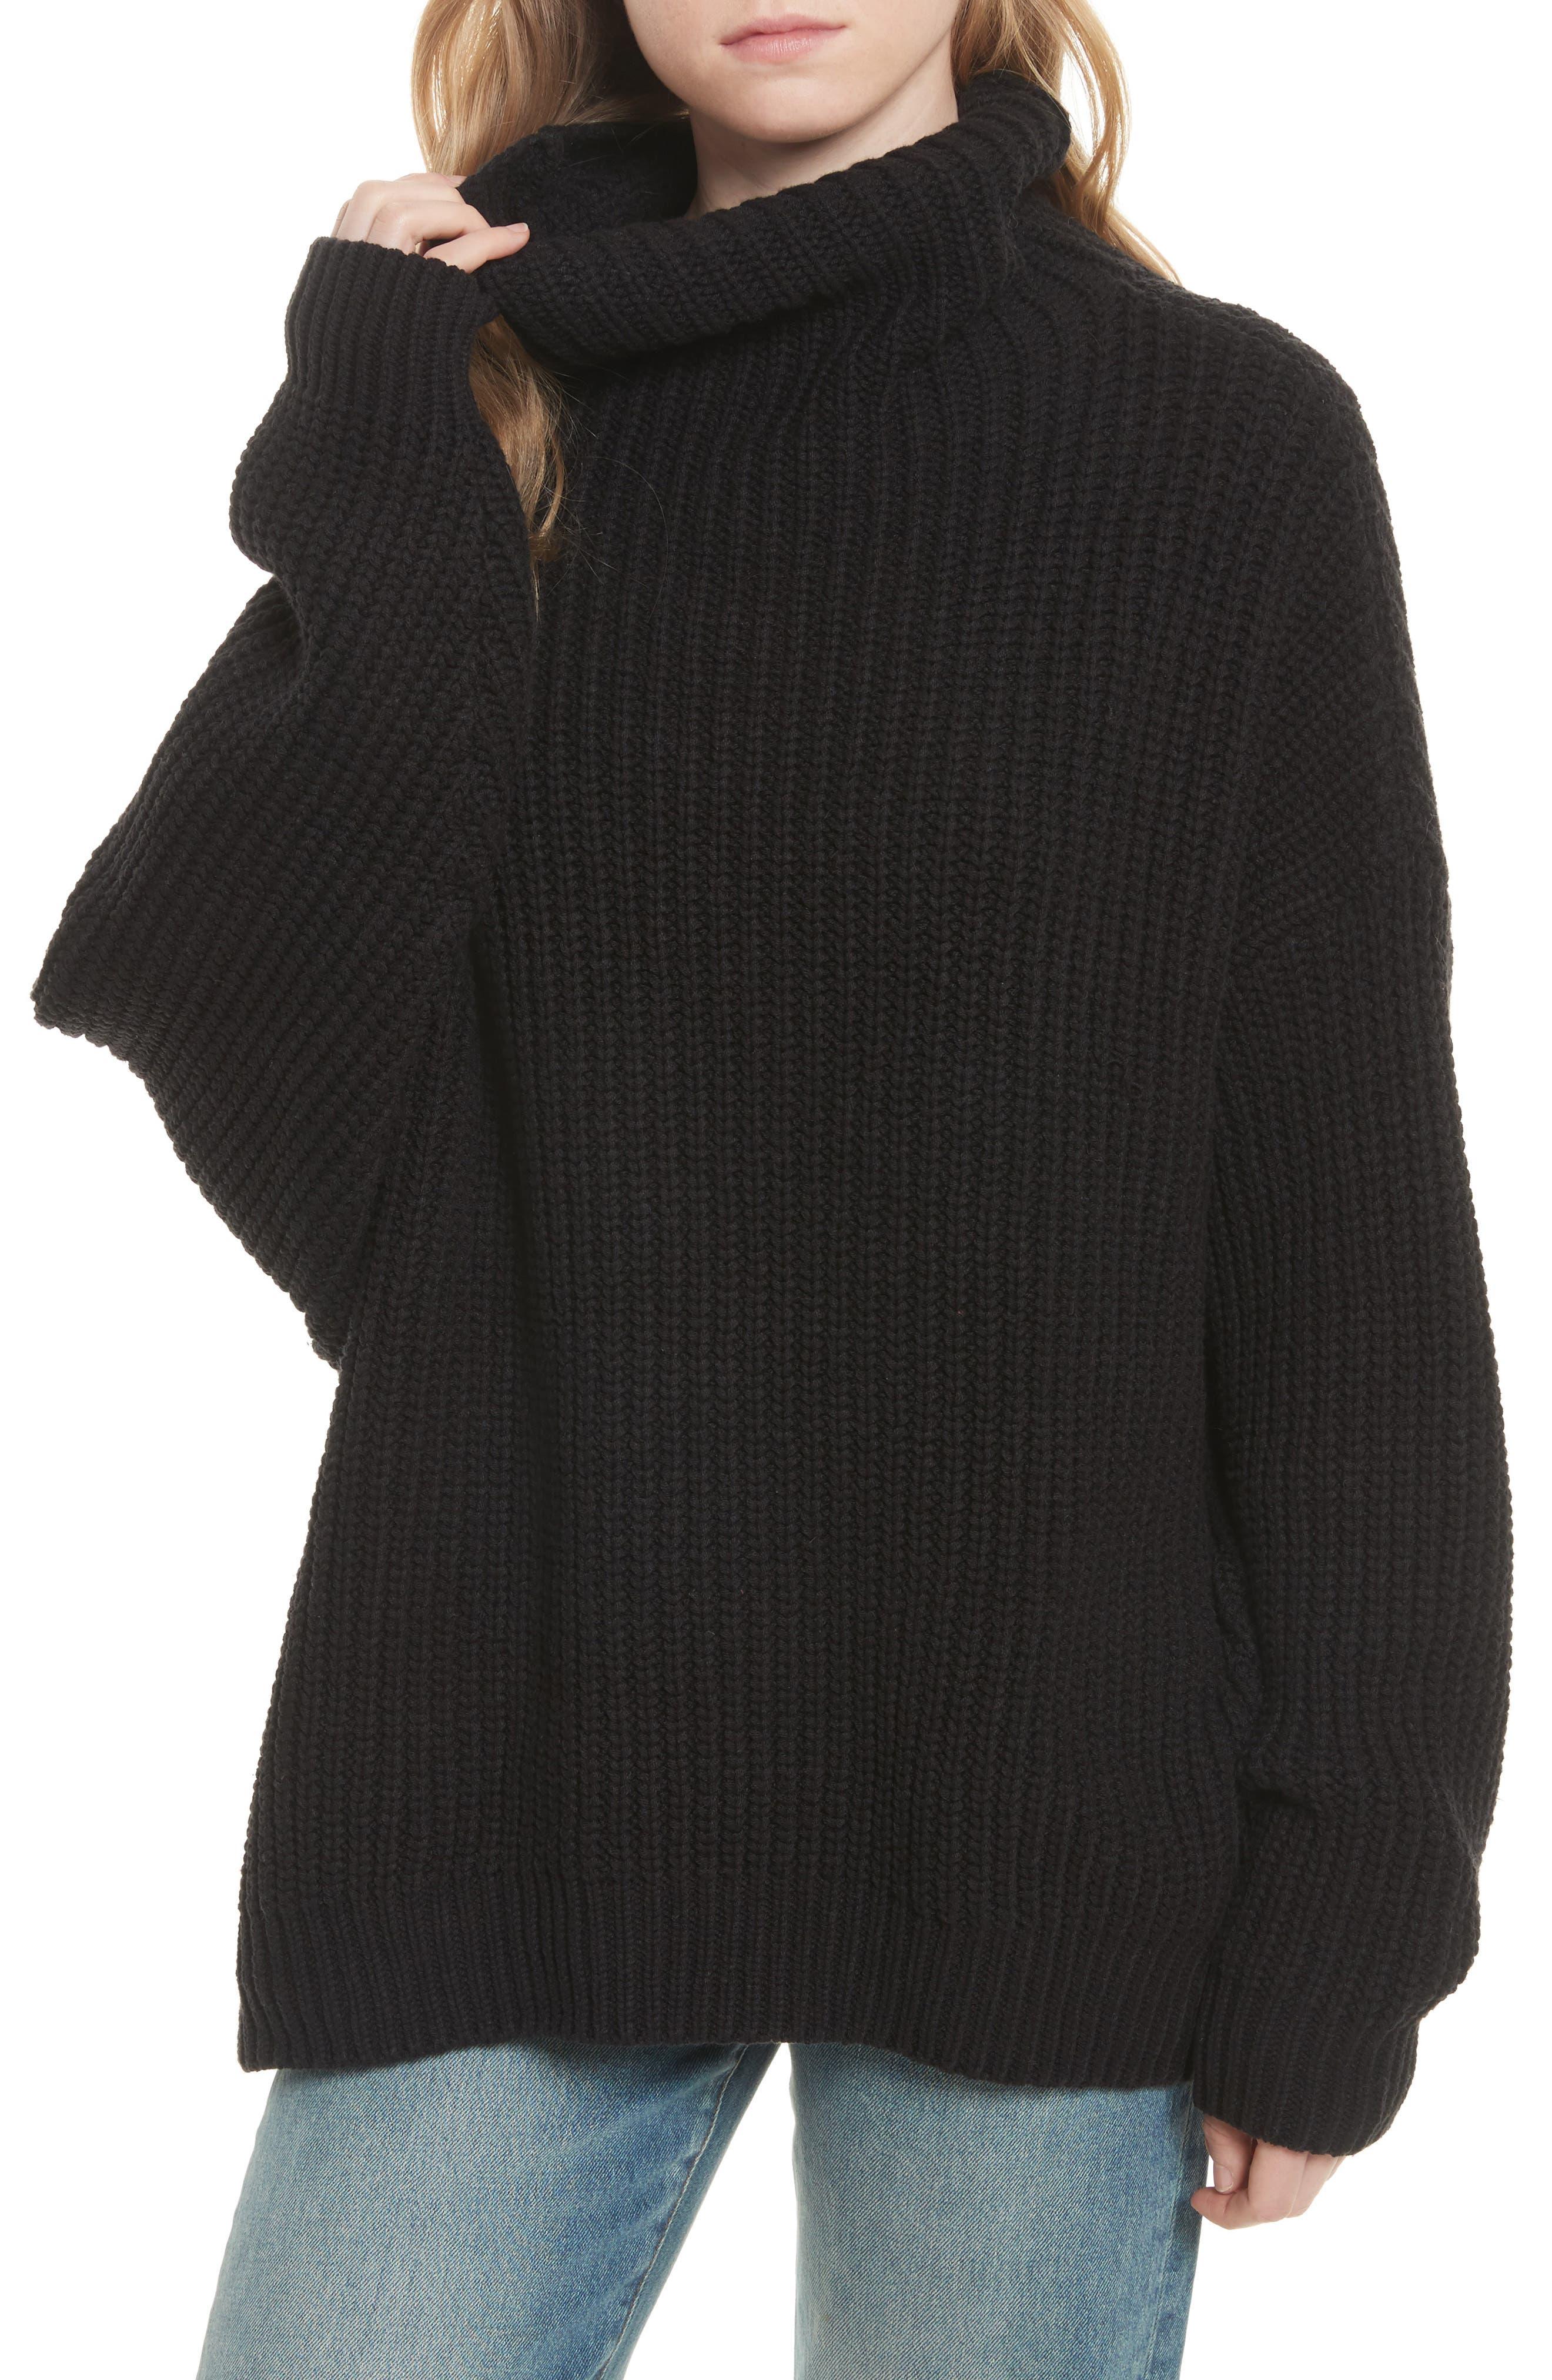 Swim Too Deep Turtleneck Sweater,                         Main,                         color, 001